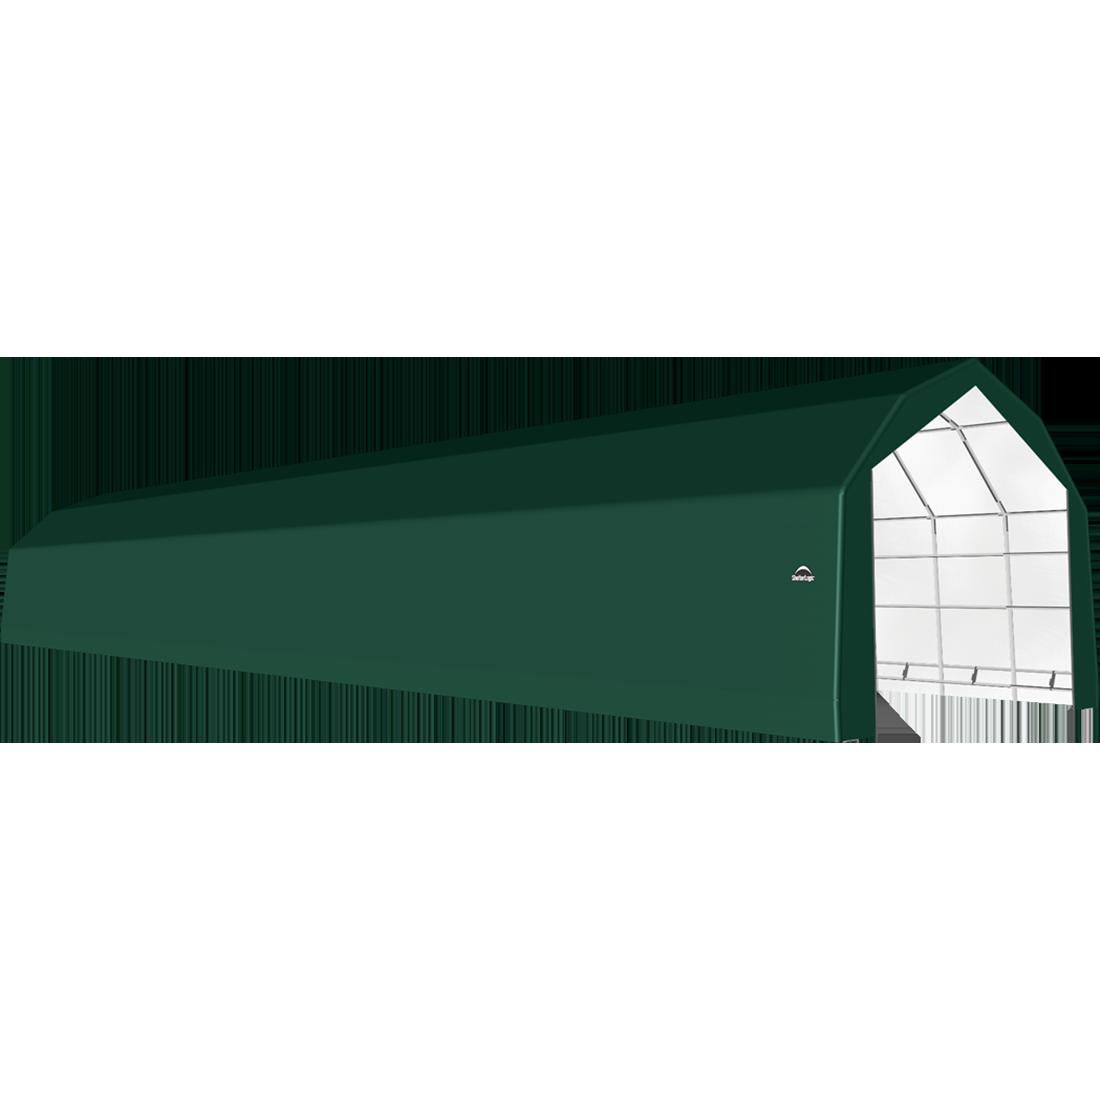 SP Barn 20X96X15 Green 14 oz PE Shelter